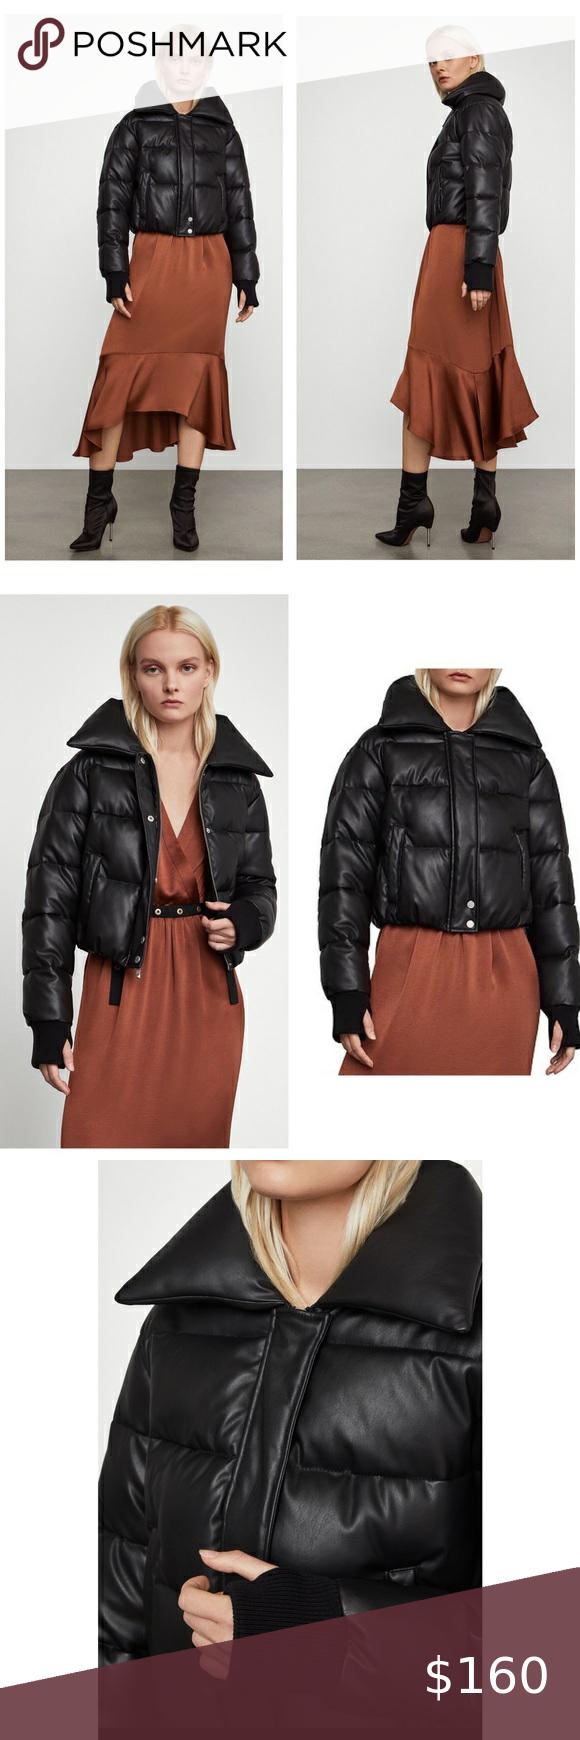 Bcbgmaxazria Clara Faux Leather Puffer Jacket Leather Puffer Jacket Jackets Clothes Design [ 1740 x 580 Pixel ]